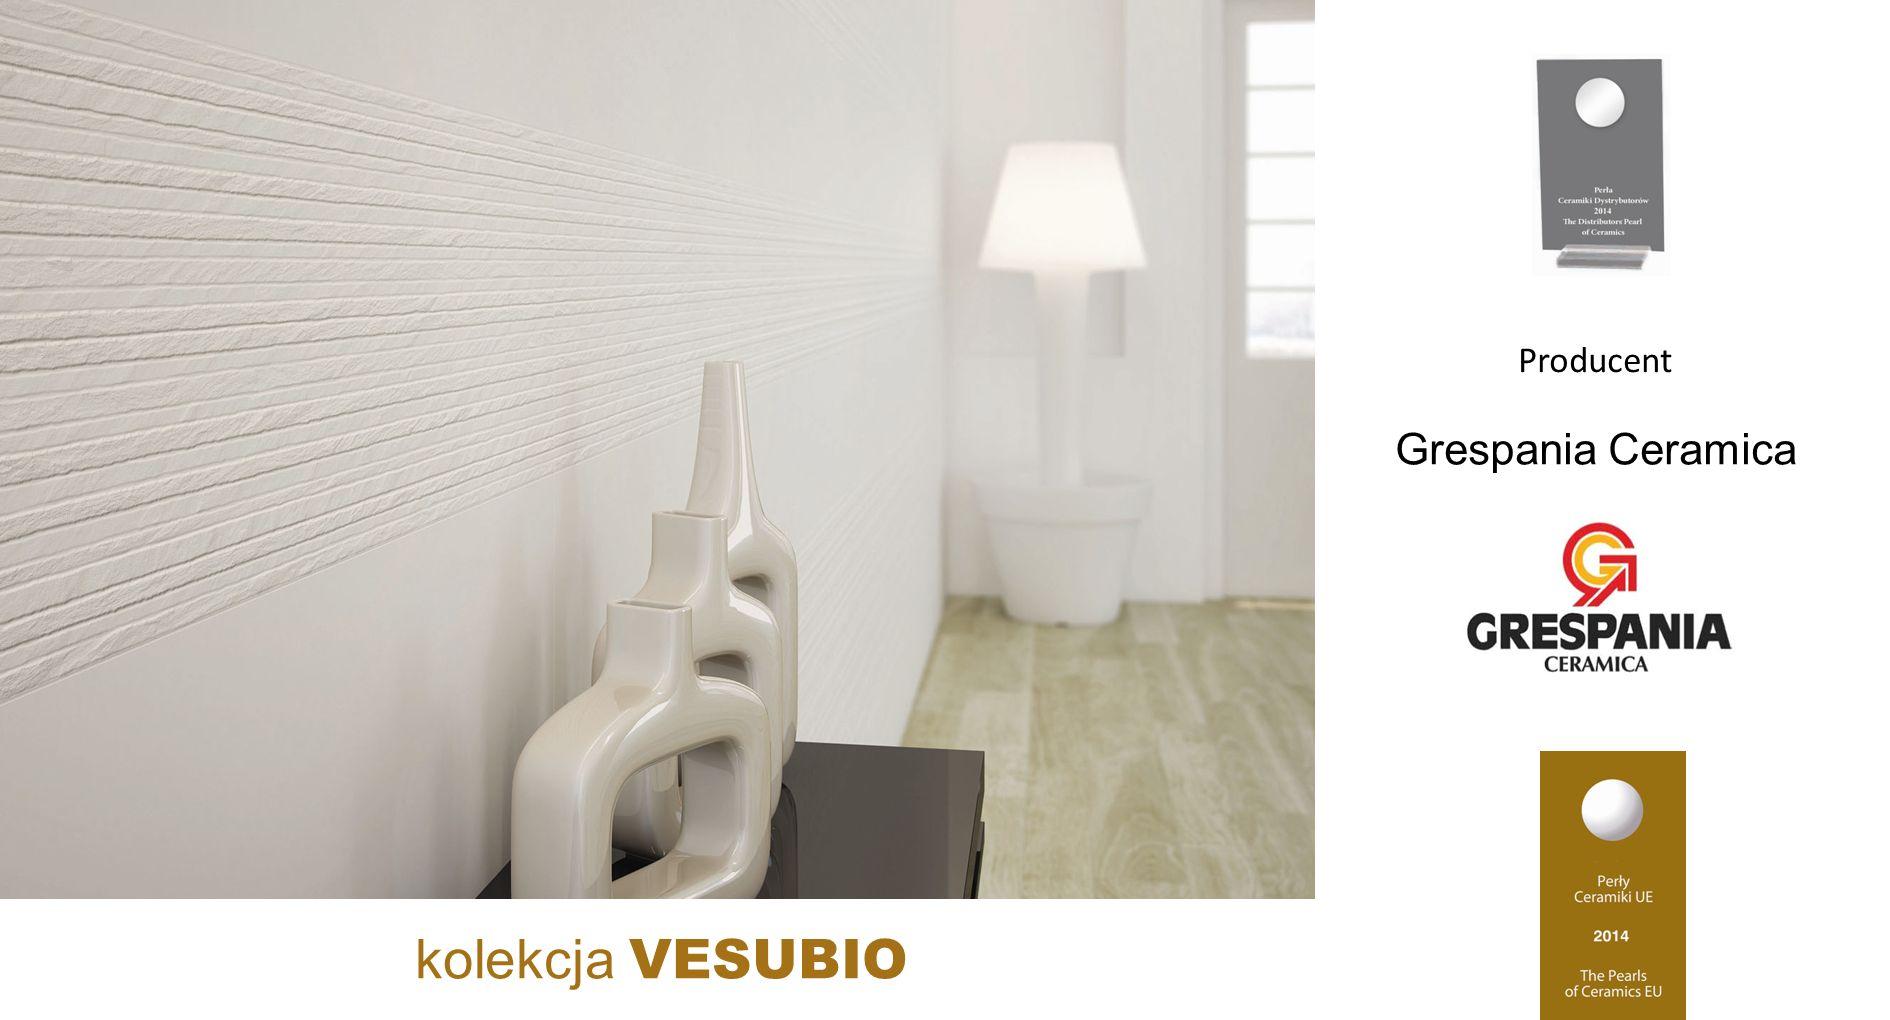 Grespania Ceramica kolekcja VESUBIO Producent